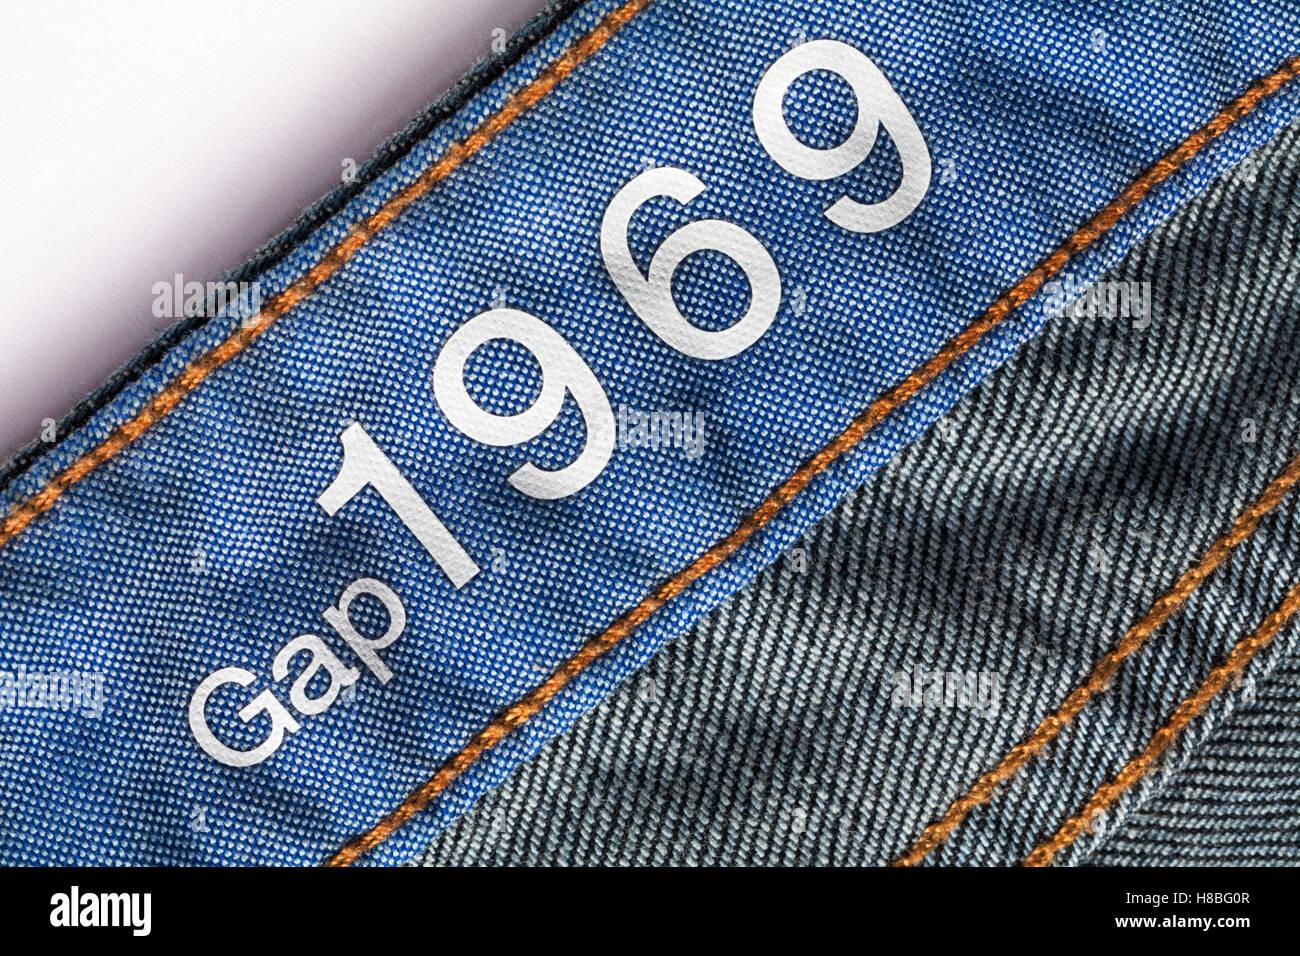 Gap 1969 Stamped In Denim Jeans Stock Photo Alamy